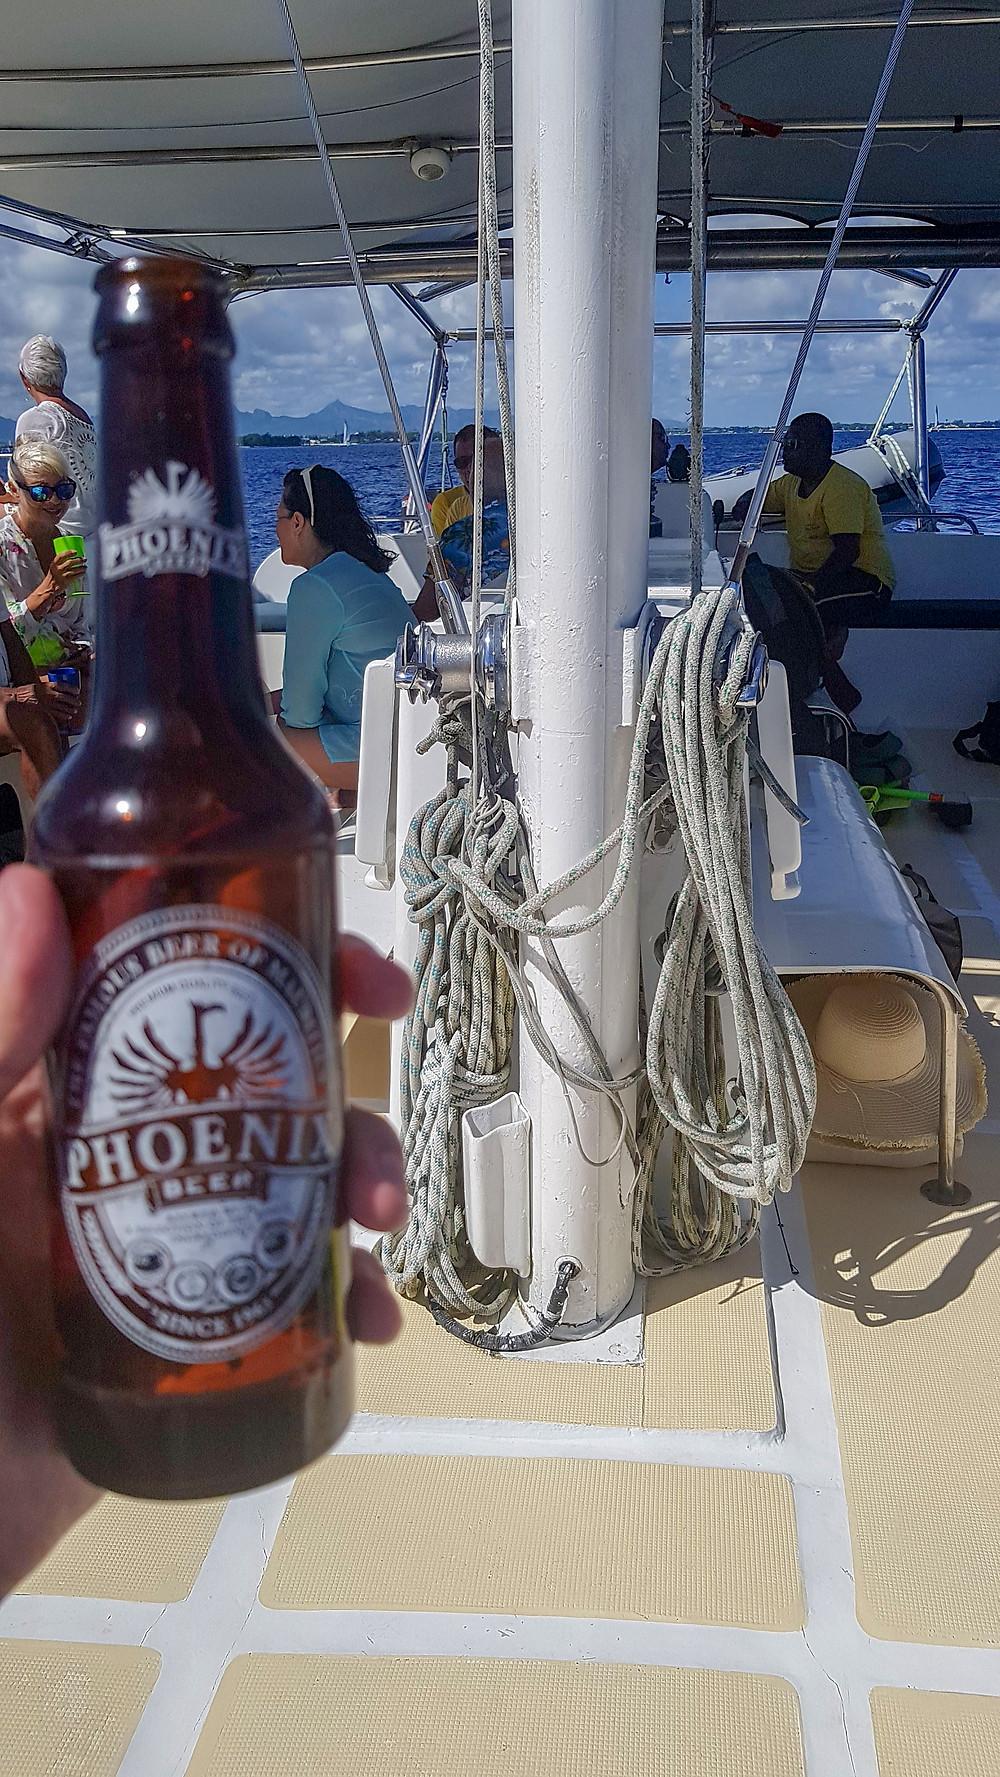 Phoenix beer, Mauritius